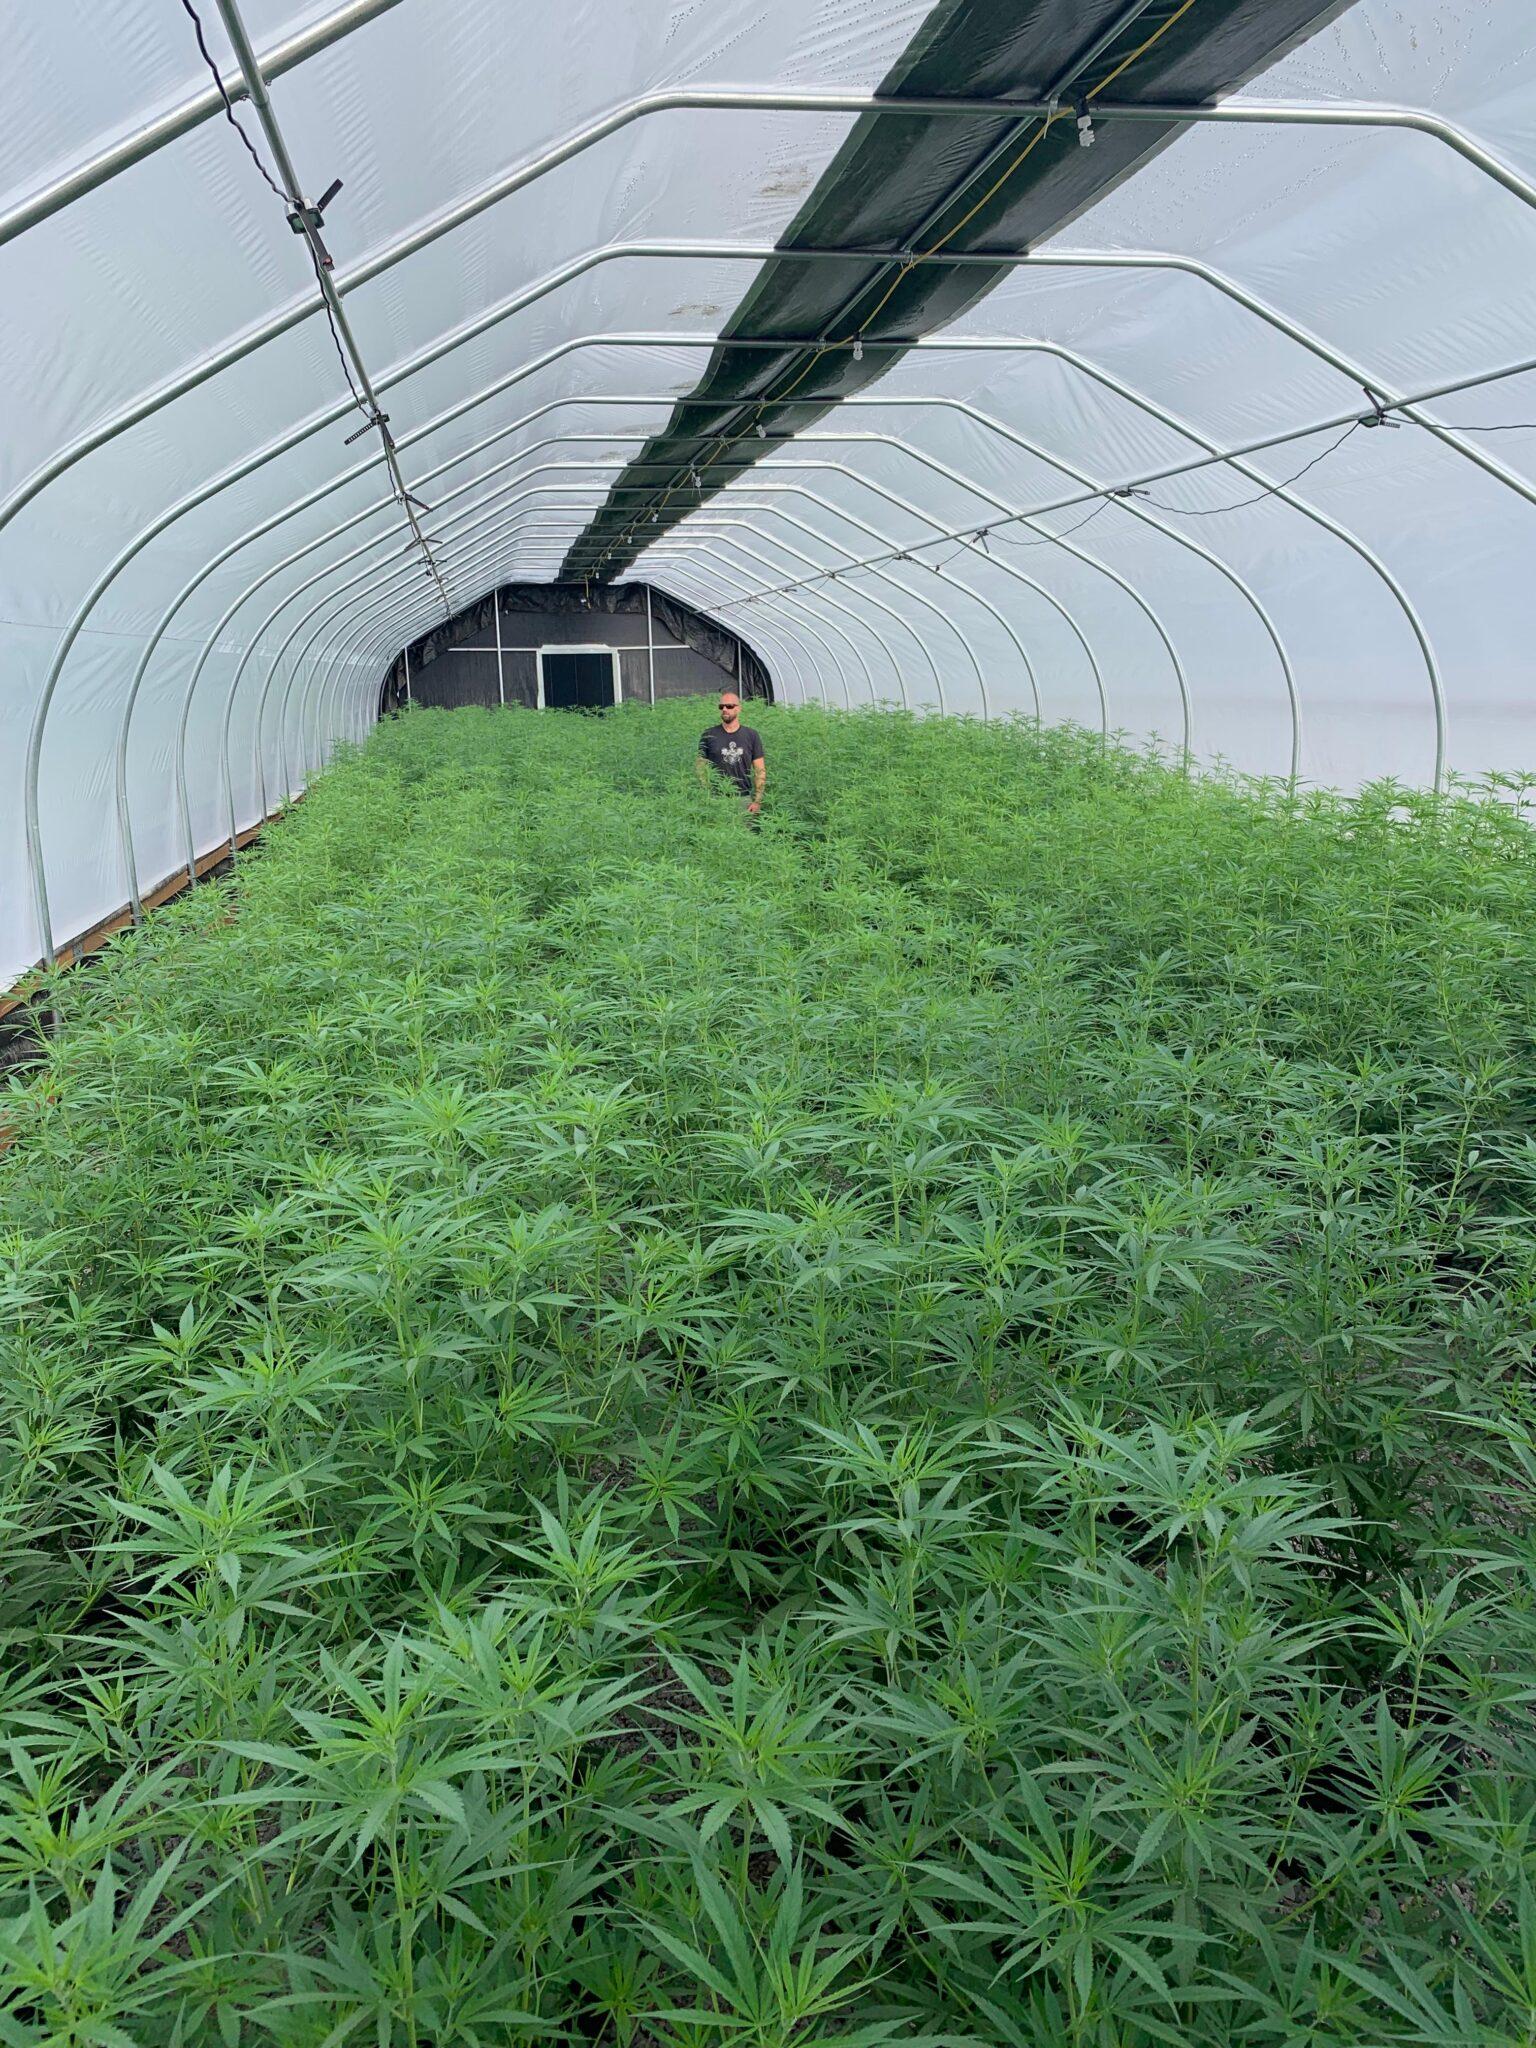 Greenhouse canopy full of healthy hemp plants